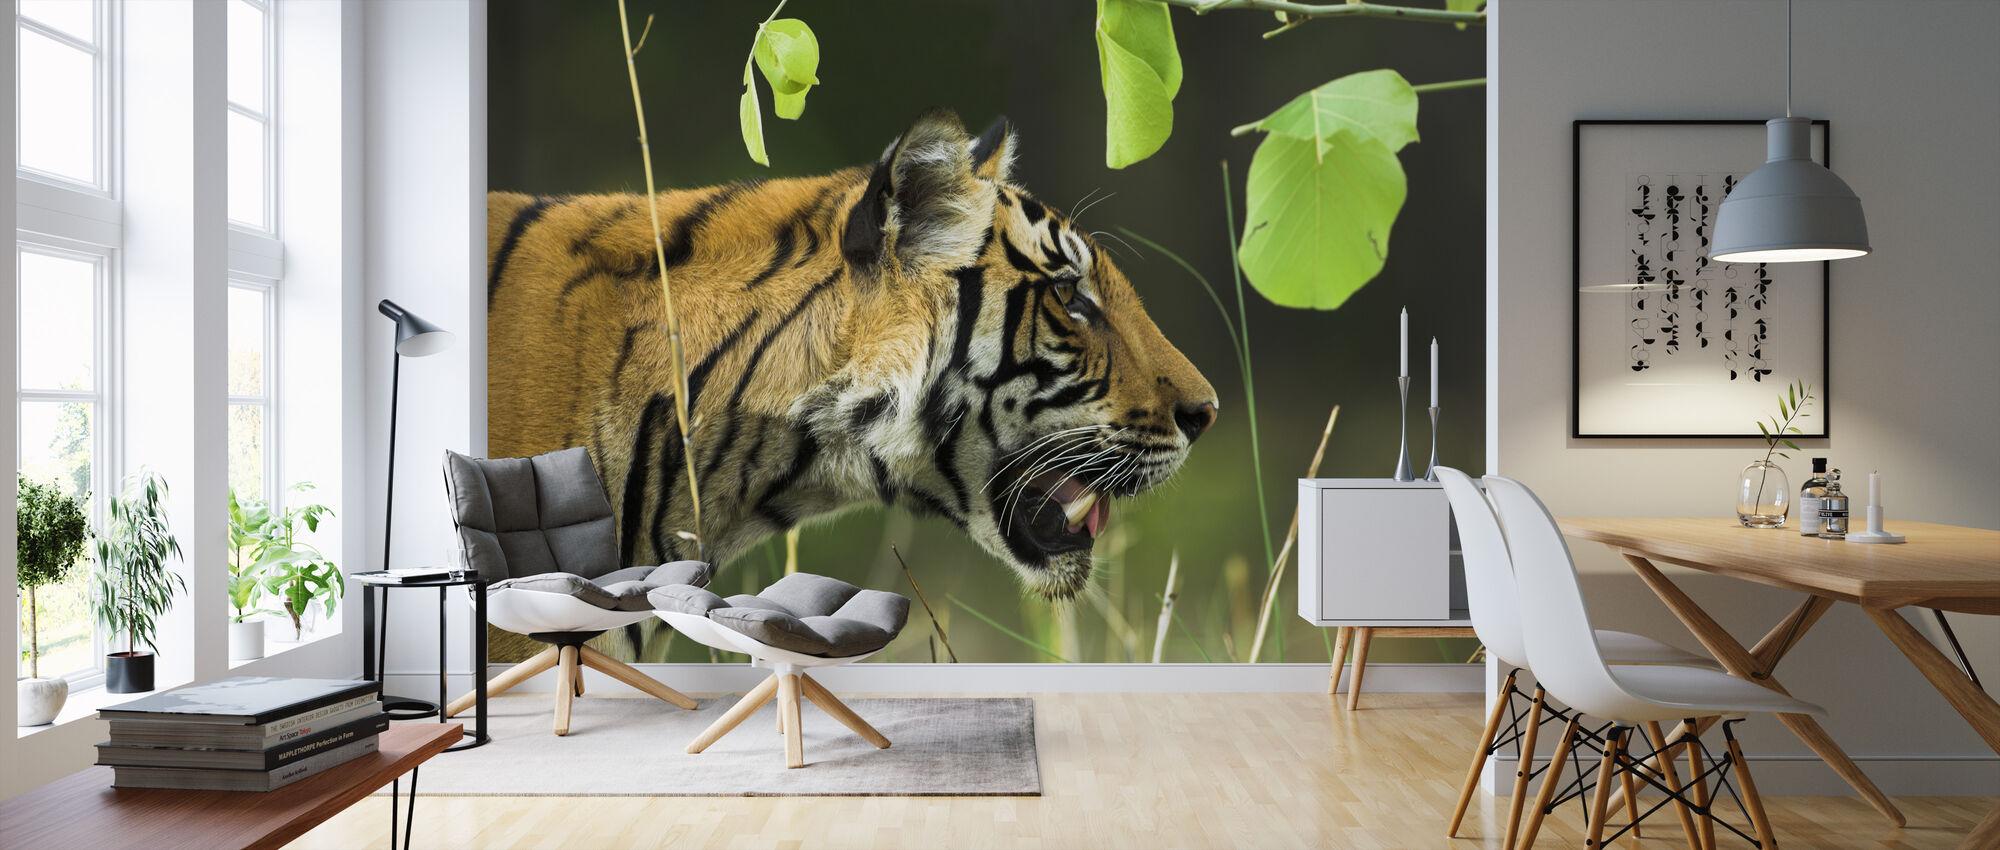 Male Bengal Tiger - Wallpaper - Living Room